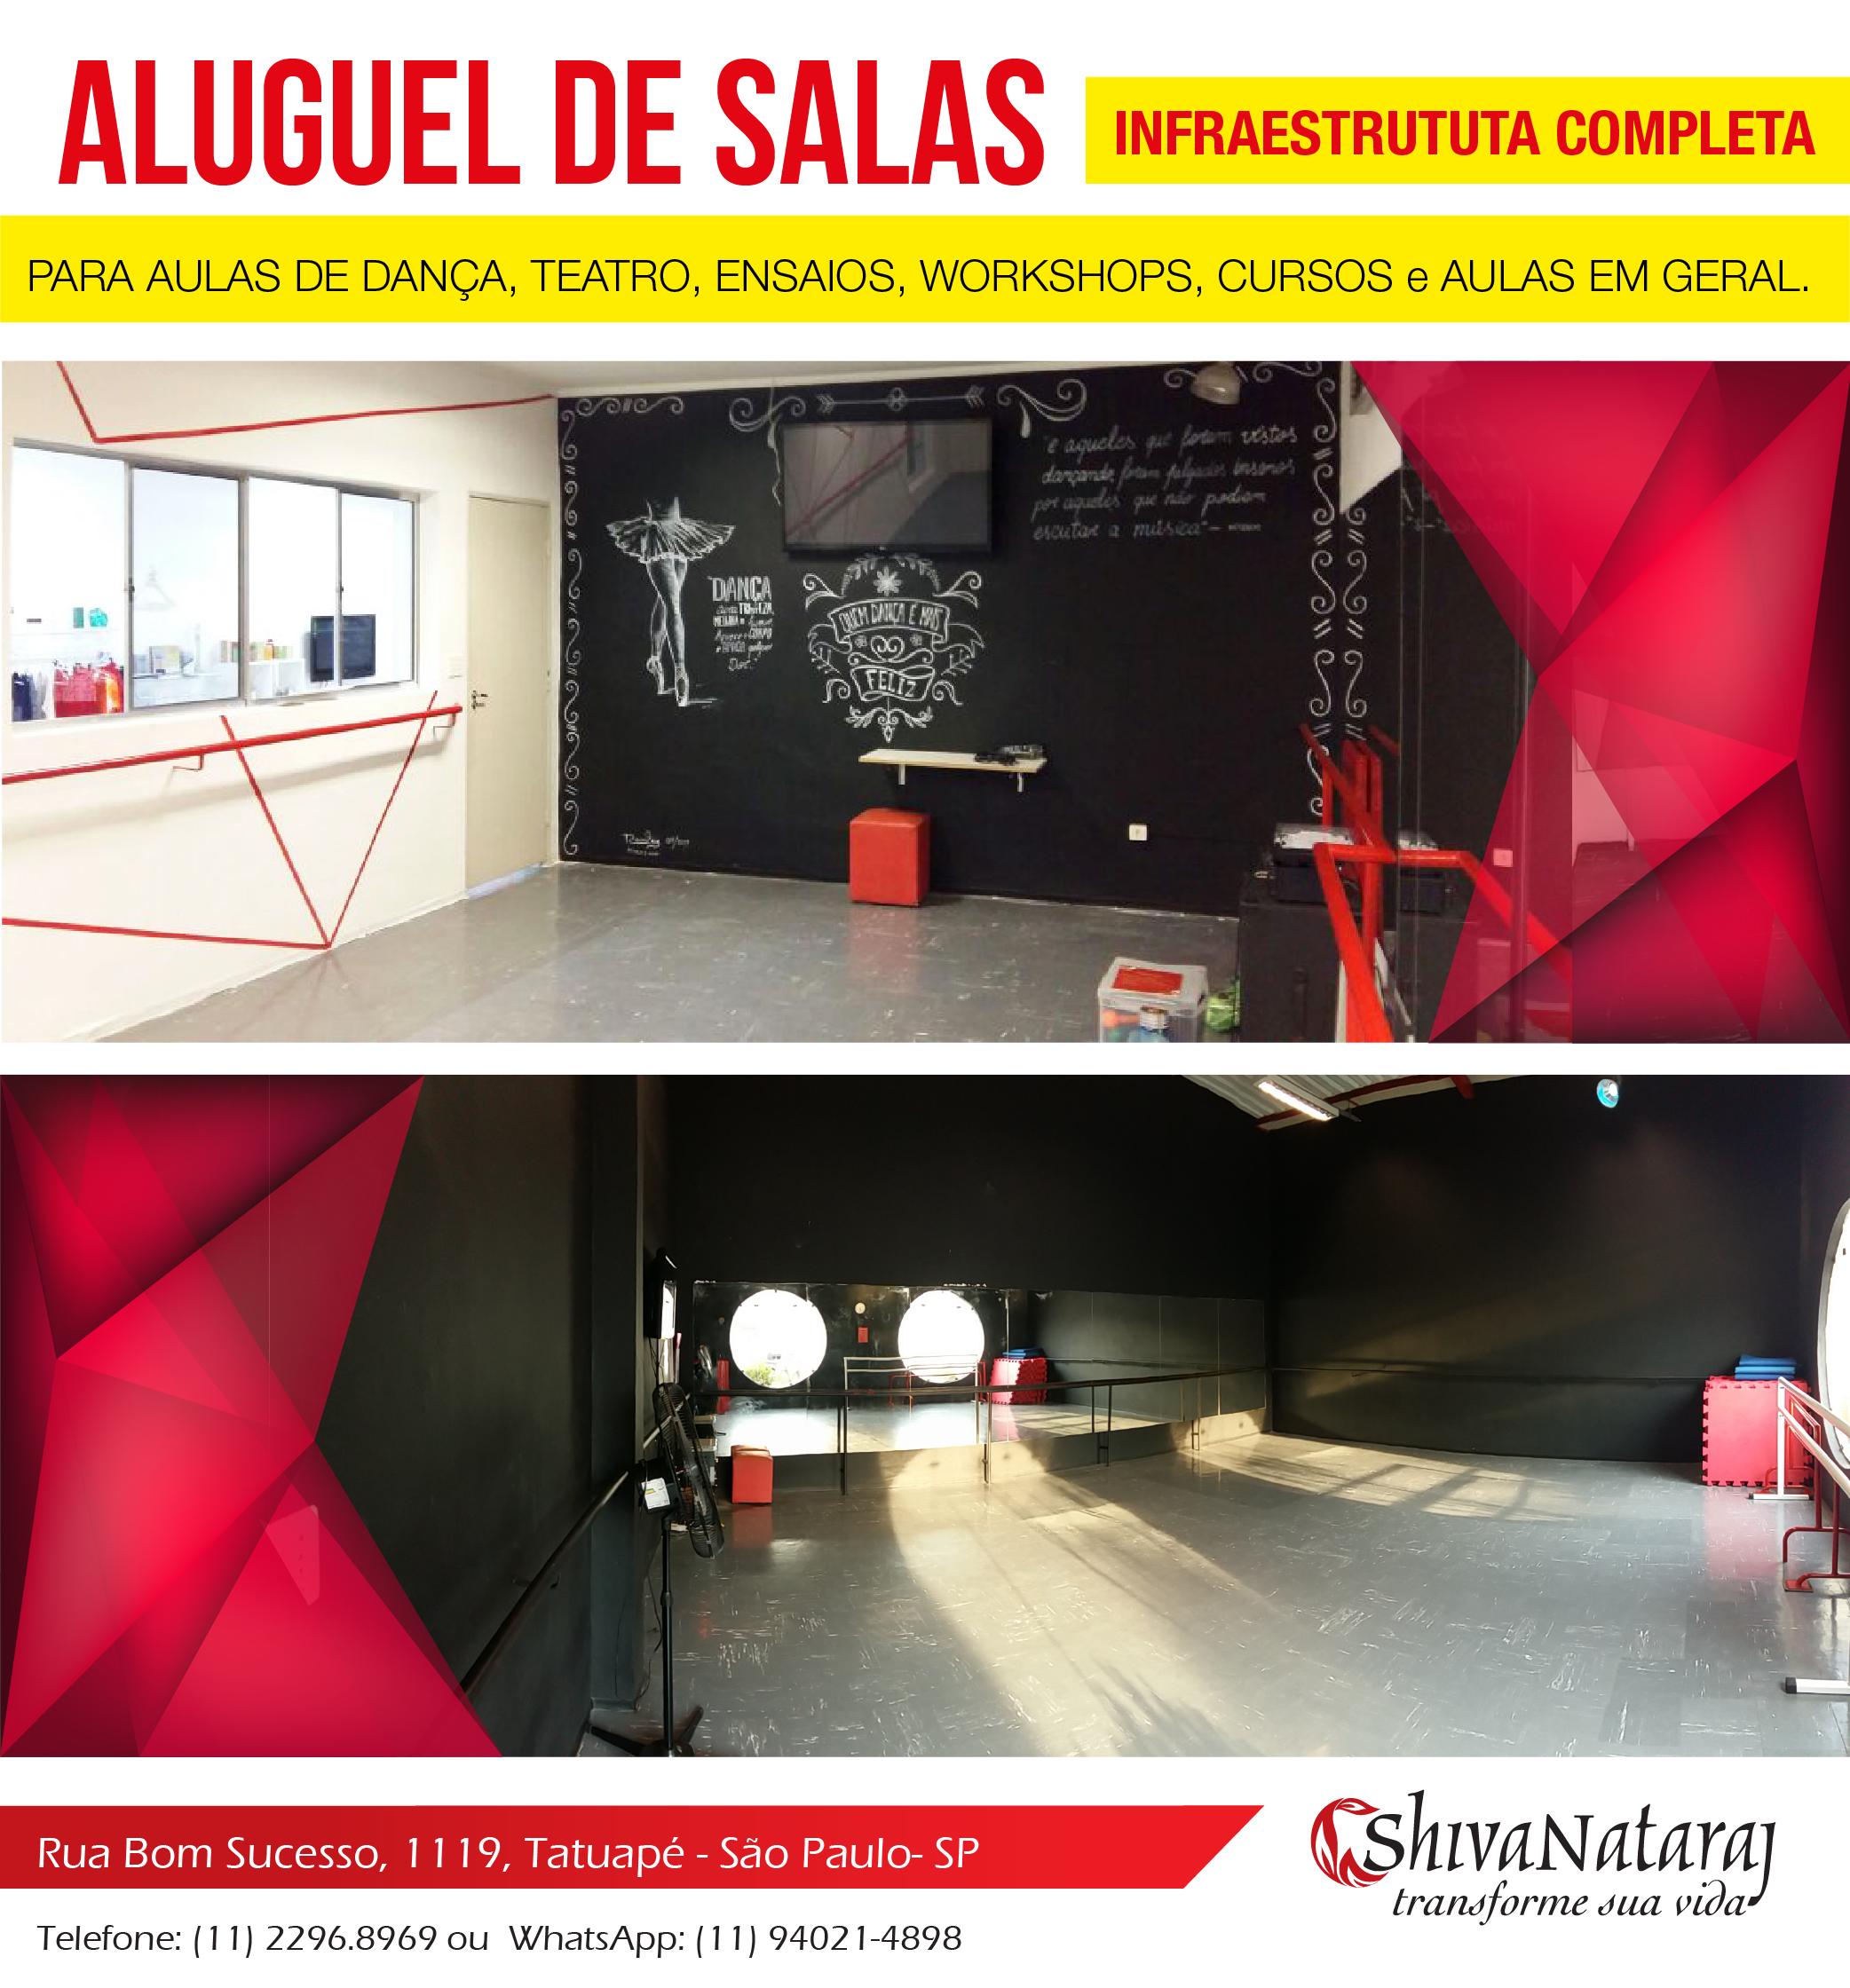 aluguel_salas_cursos_workshops_aulas